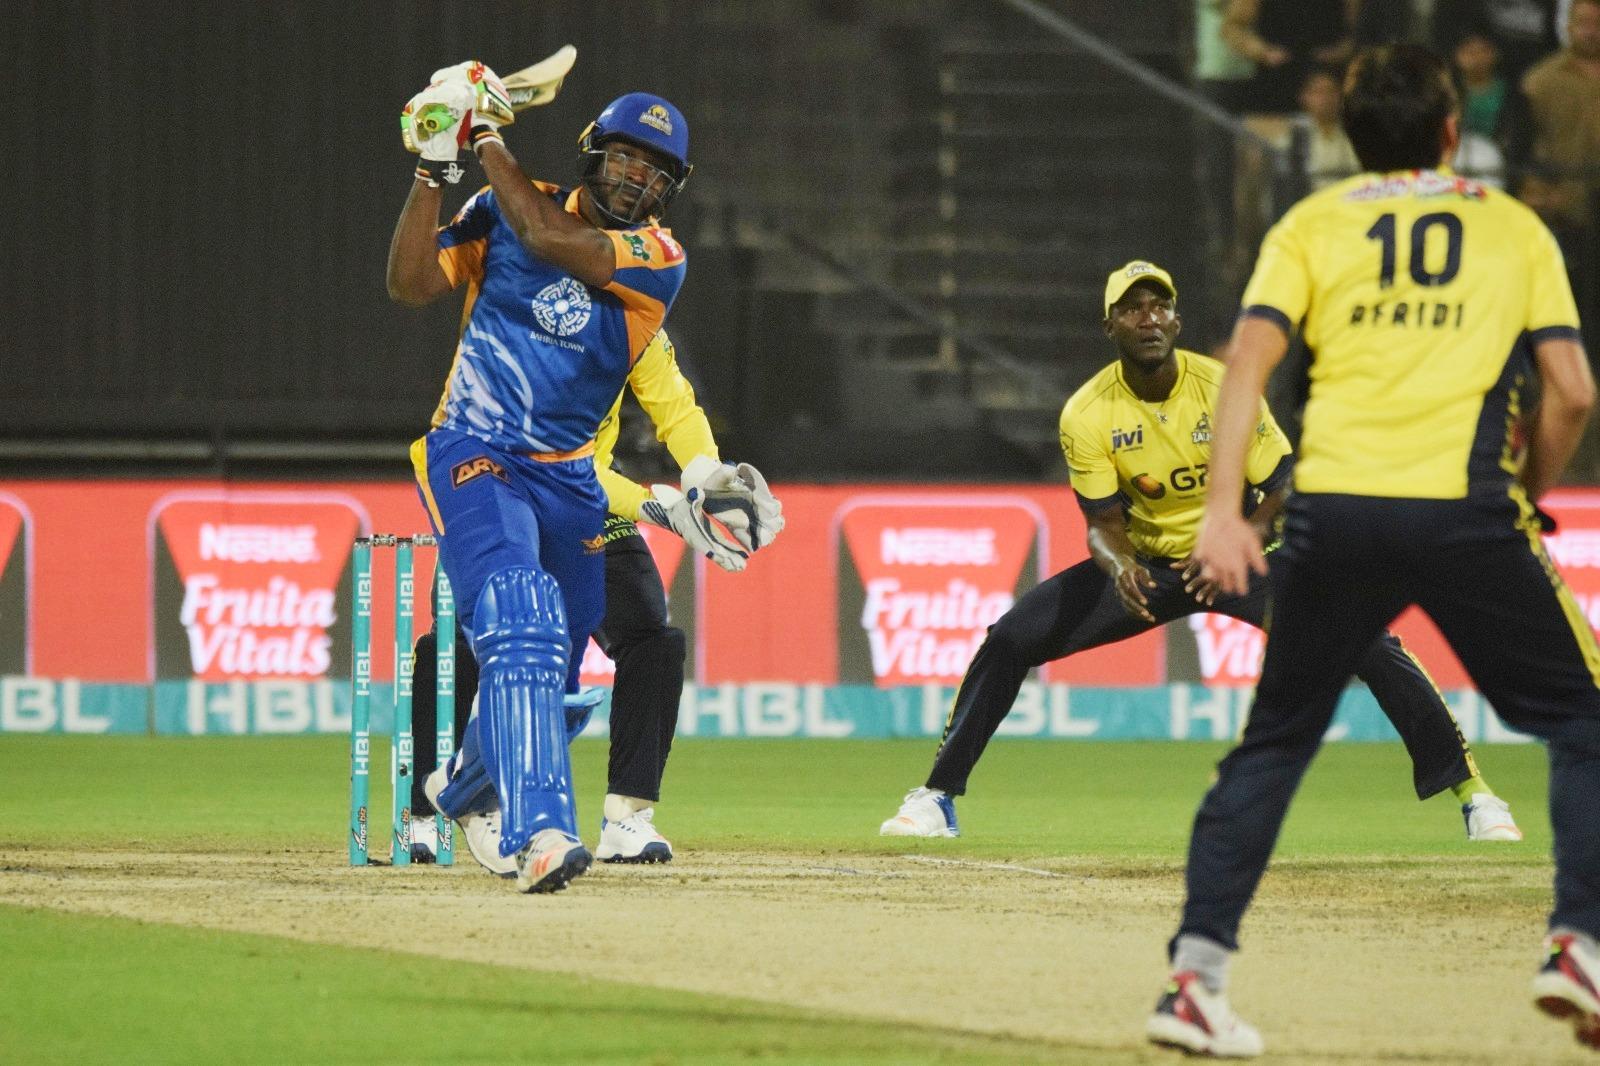 gayle sangakkara refuse to play psl final in lahore